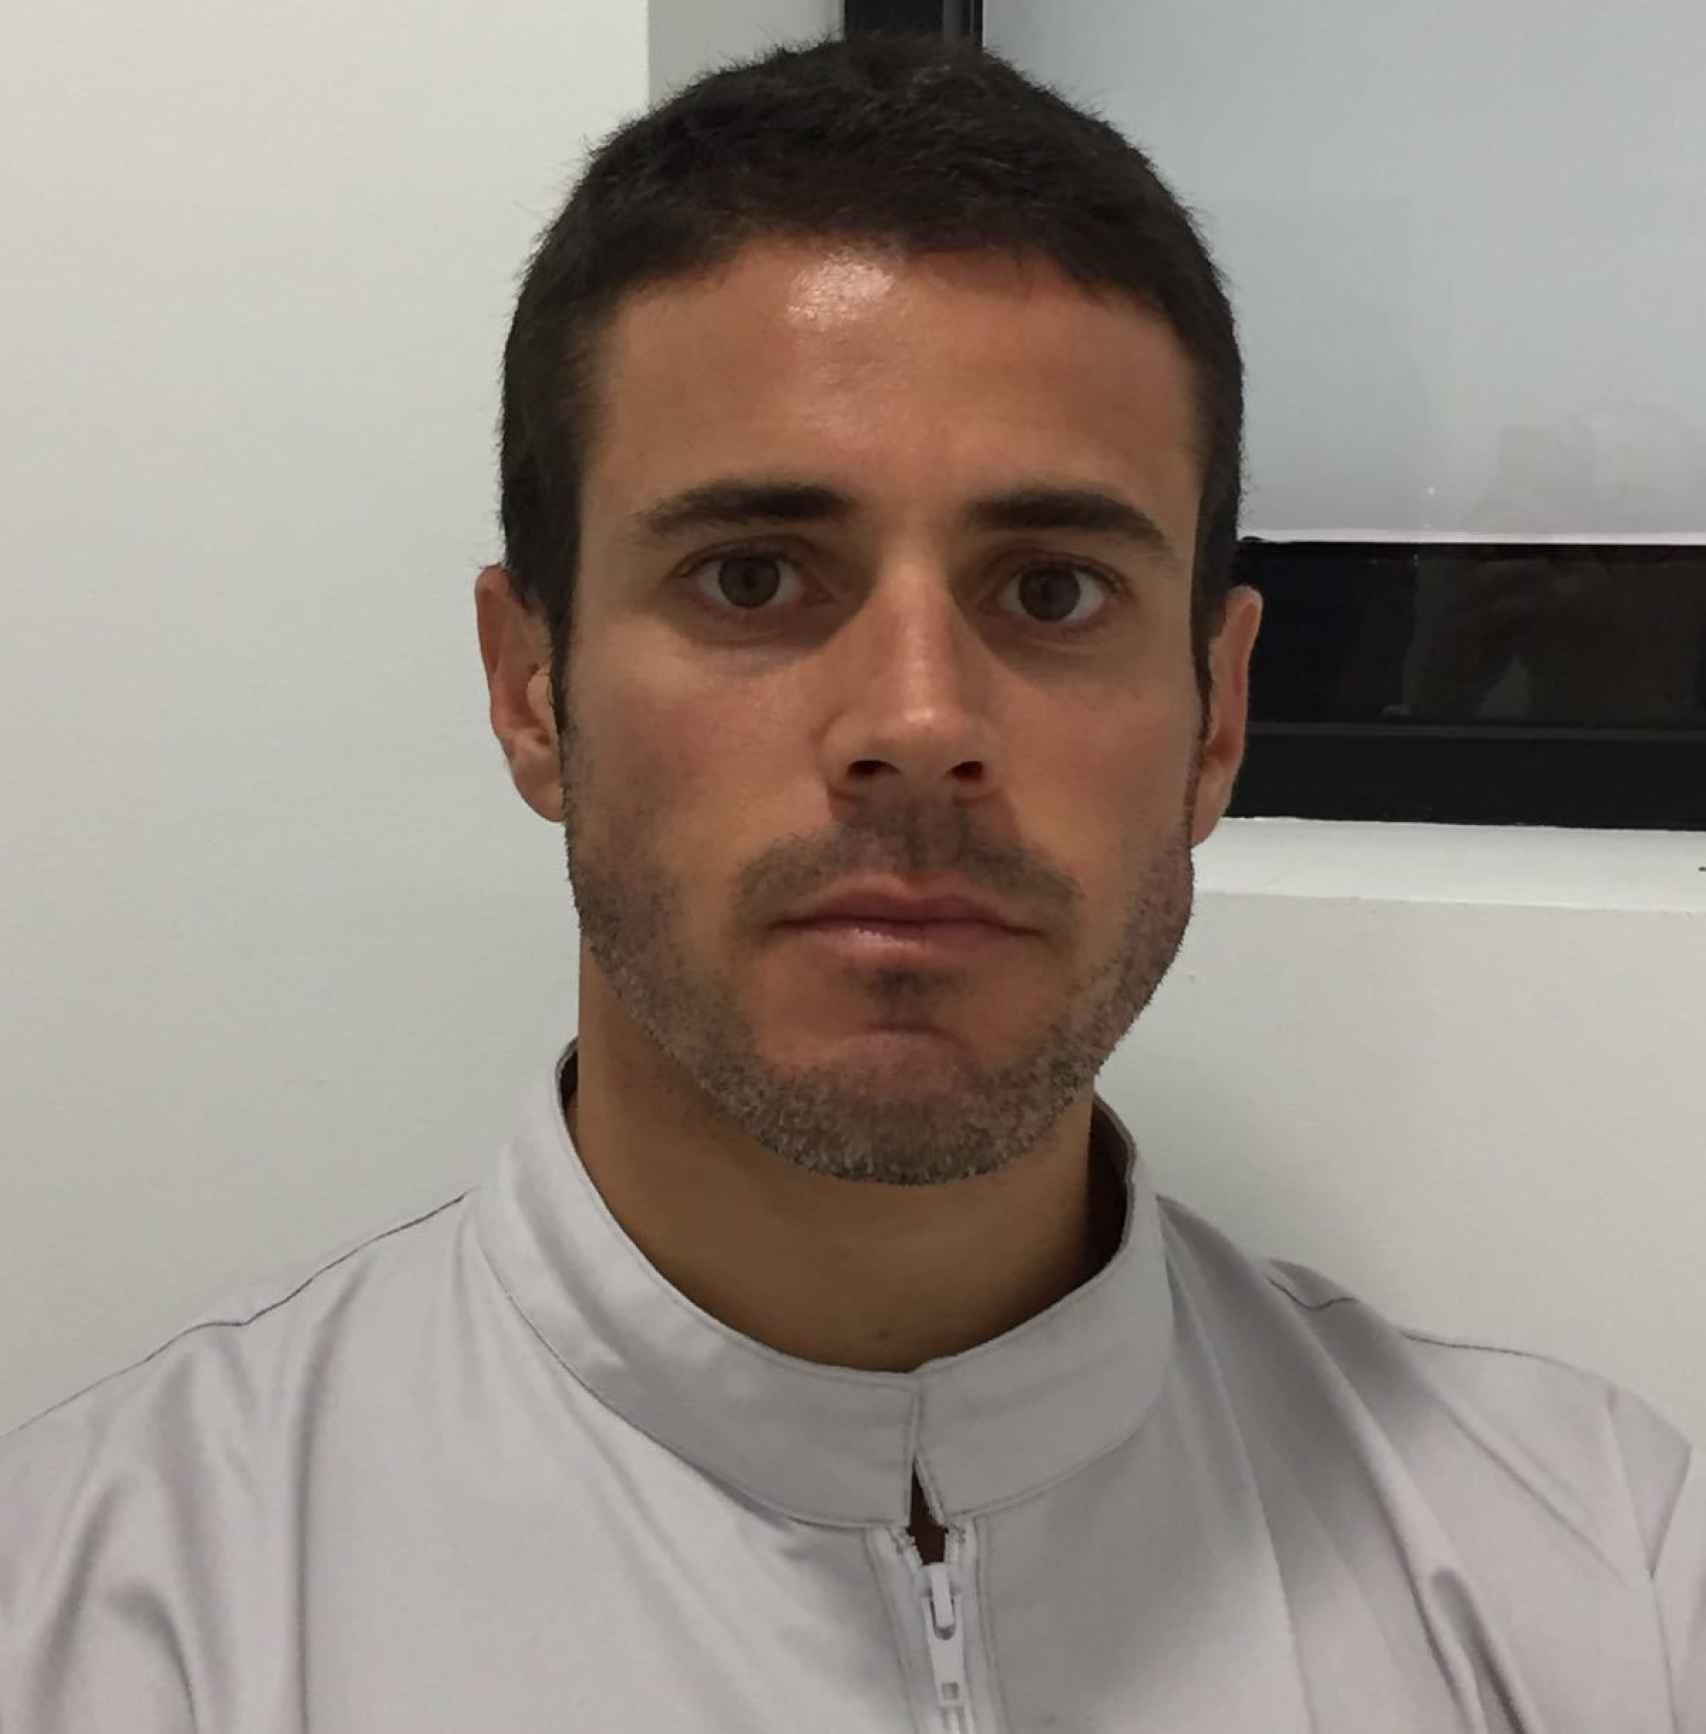 Castor Benítez trabajó en iDental desde marzo del 2015 a septiembre de 2016.